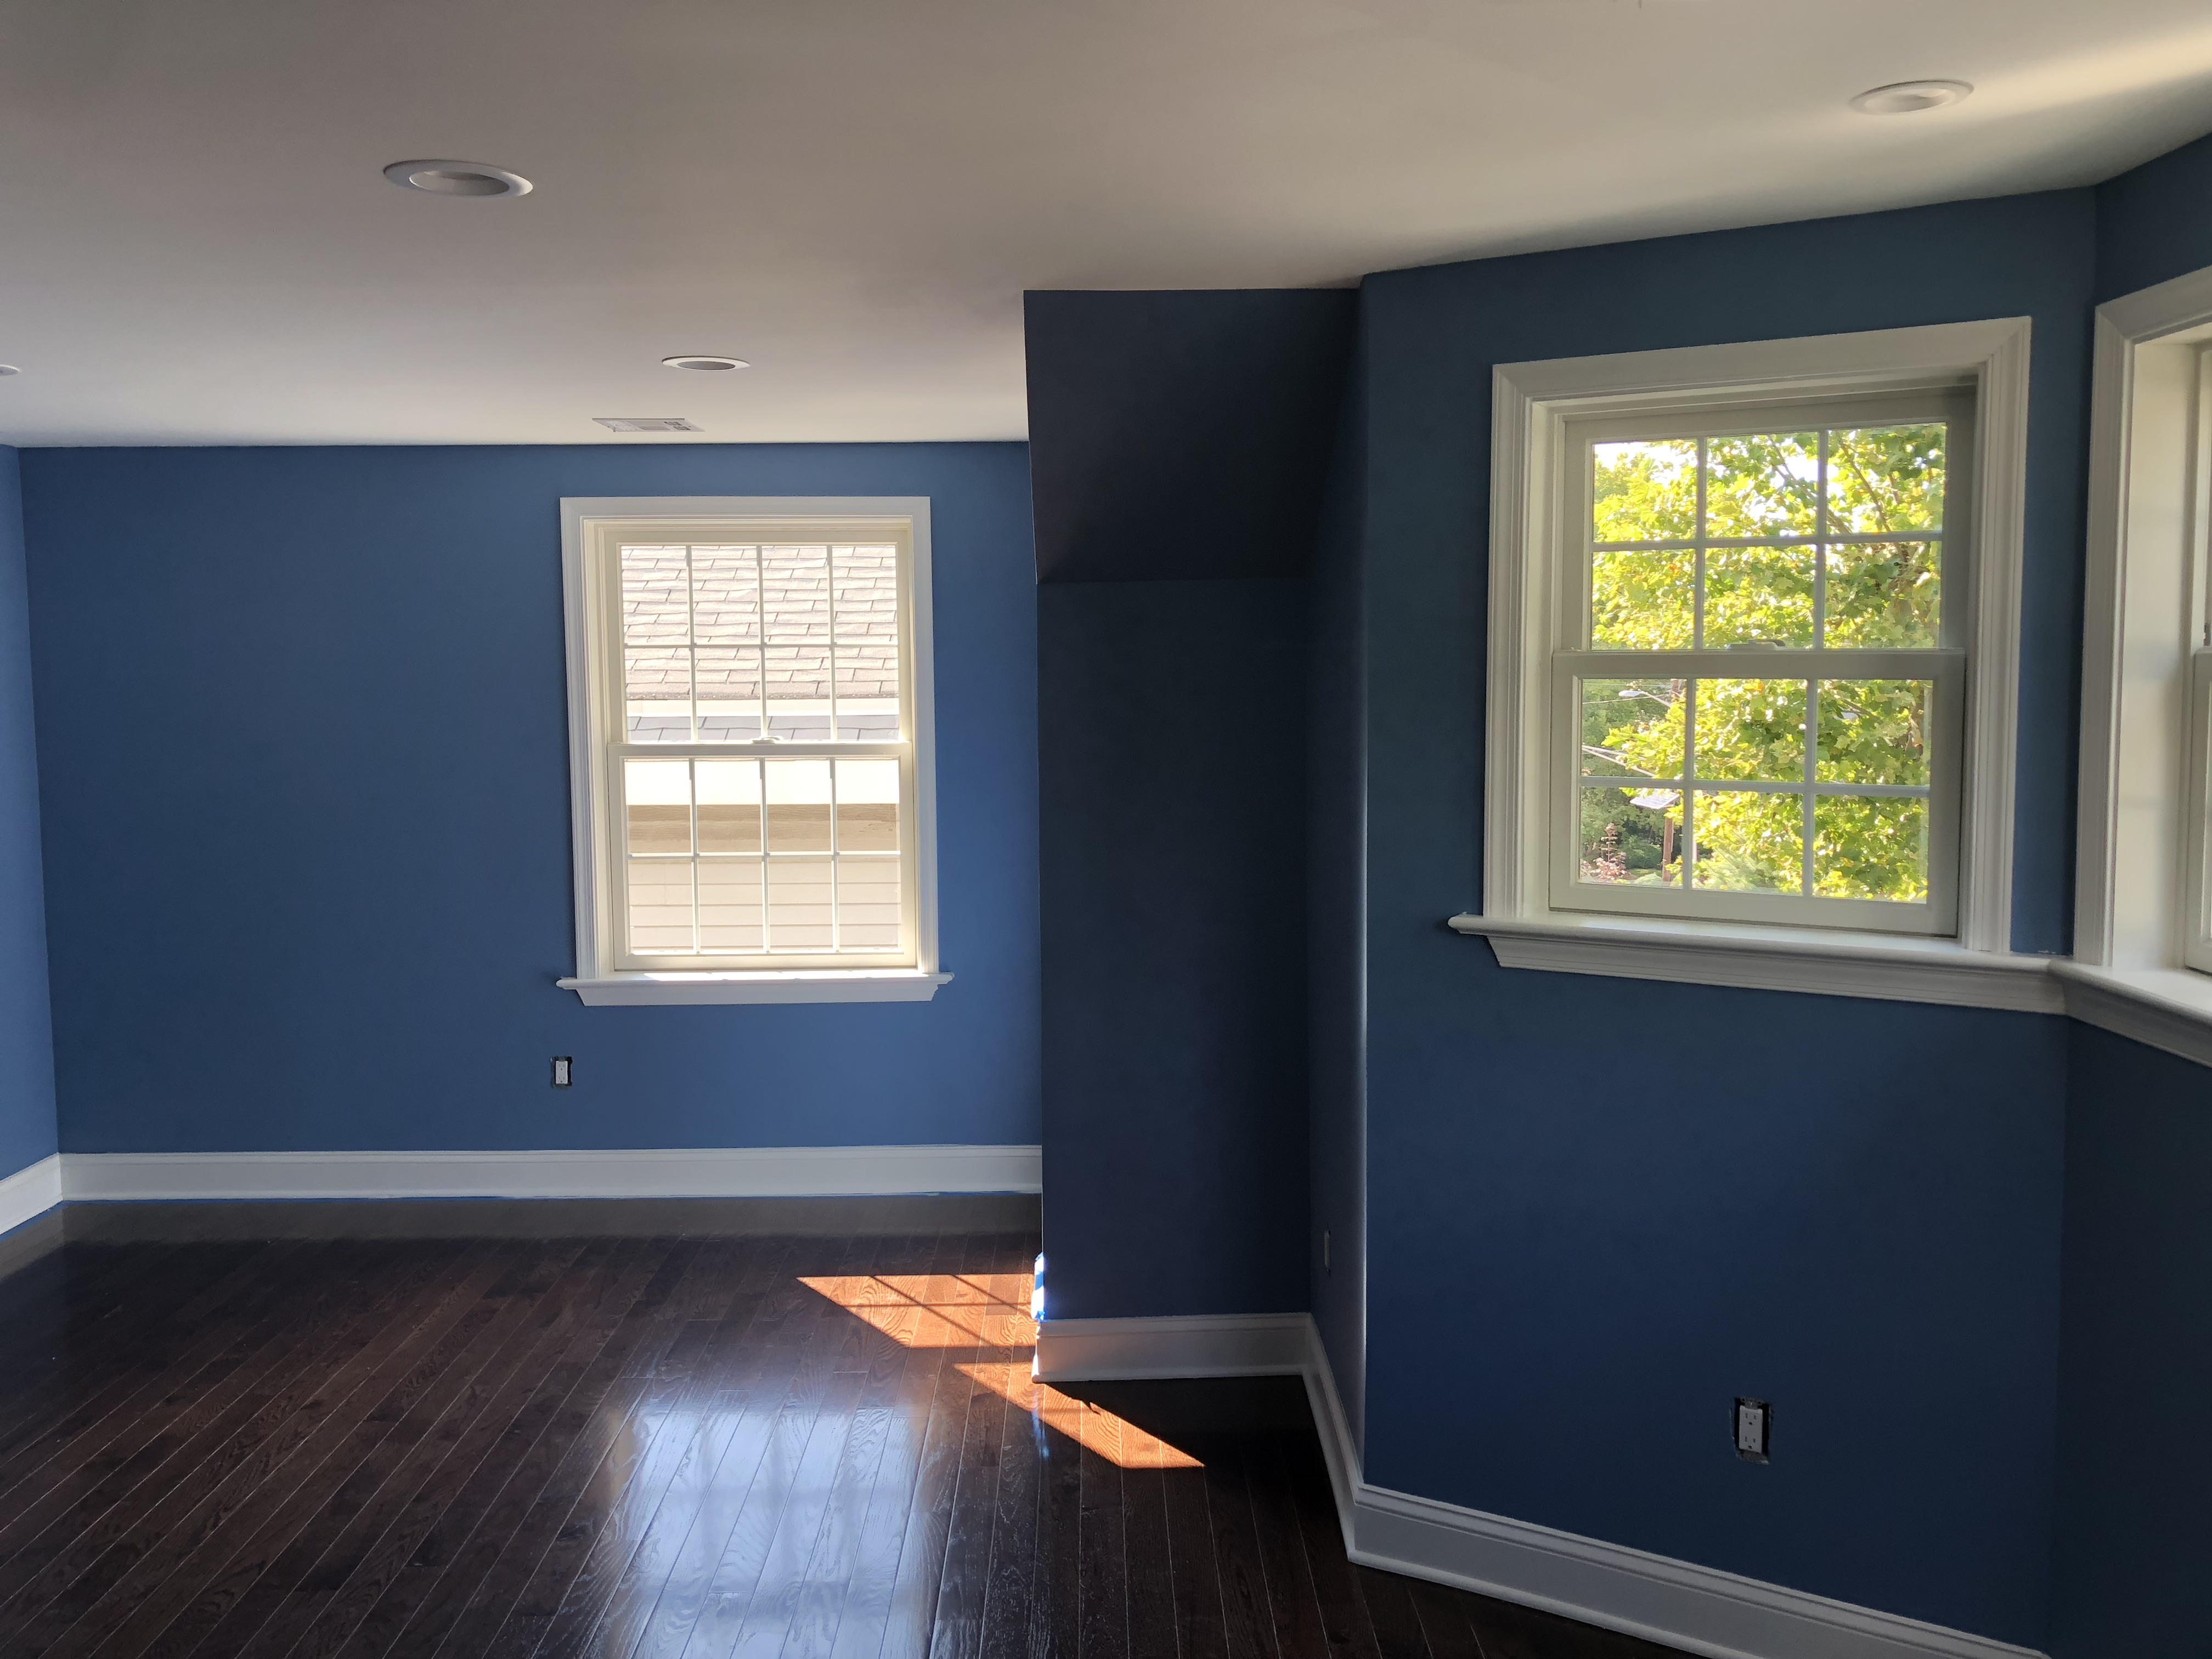 Exterior Repaint Home improvement